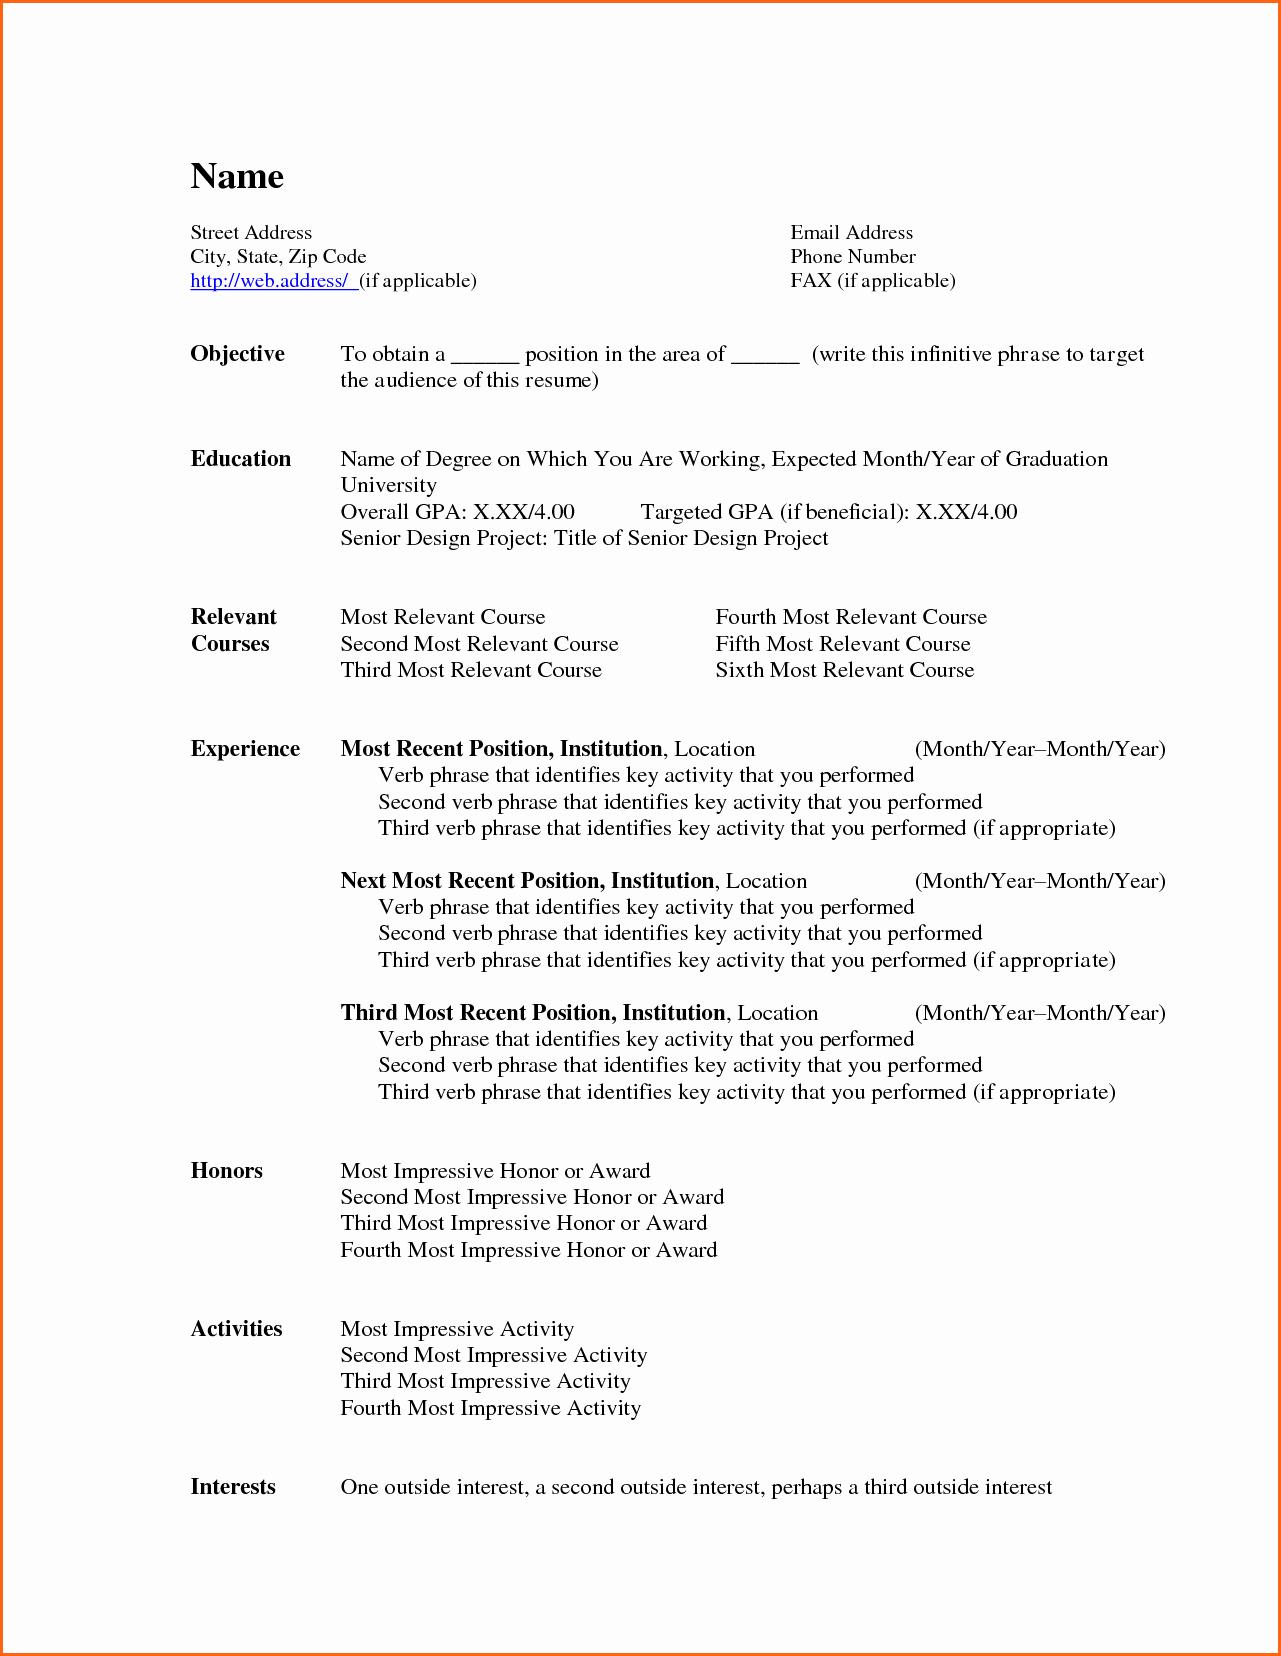 Resume Templates On Word 2007 Luxury 6 Free Resume Templates Microsoft Word 2007 Bud